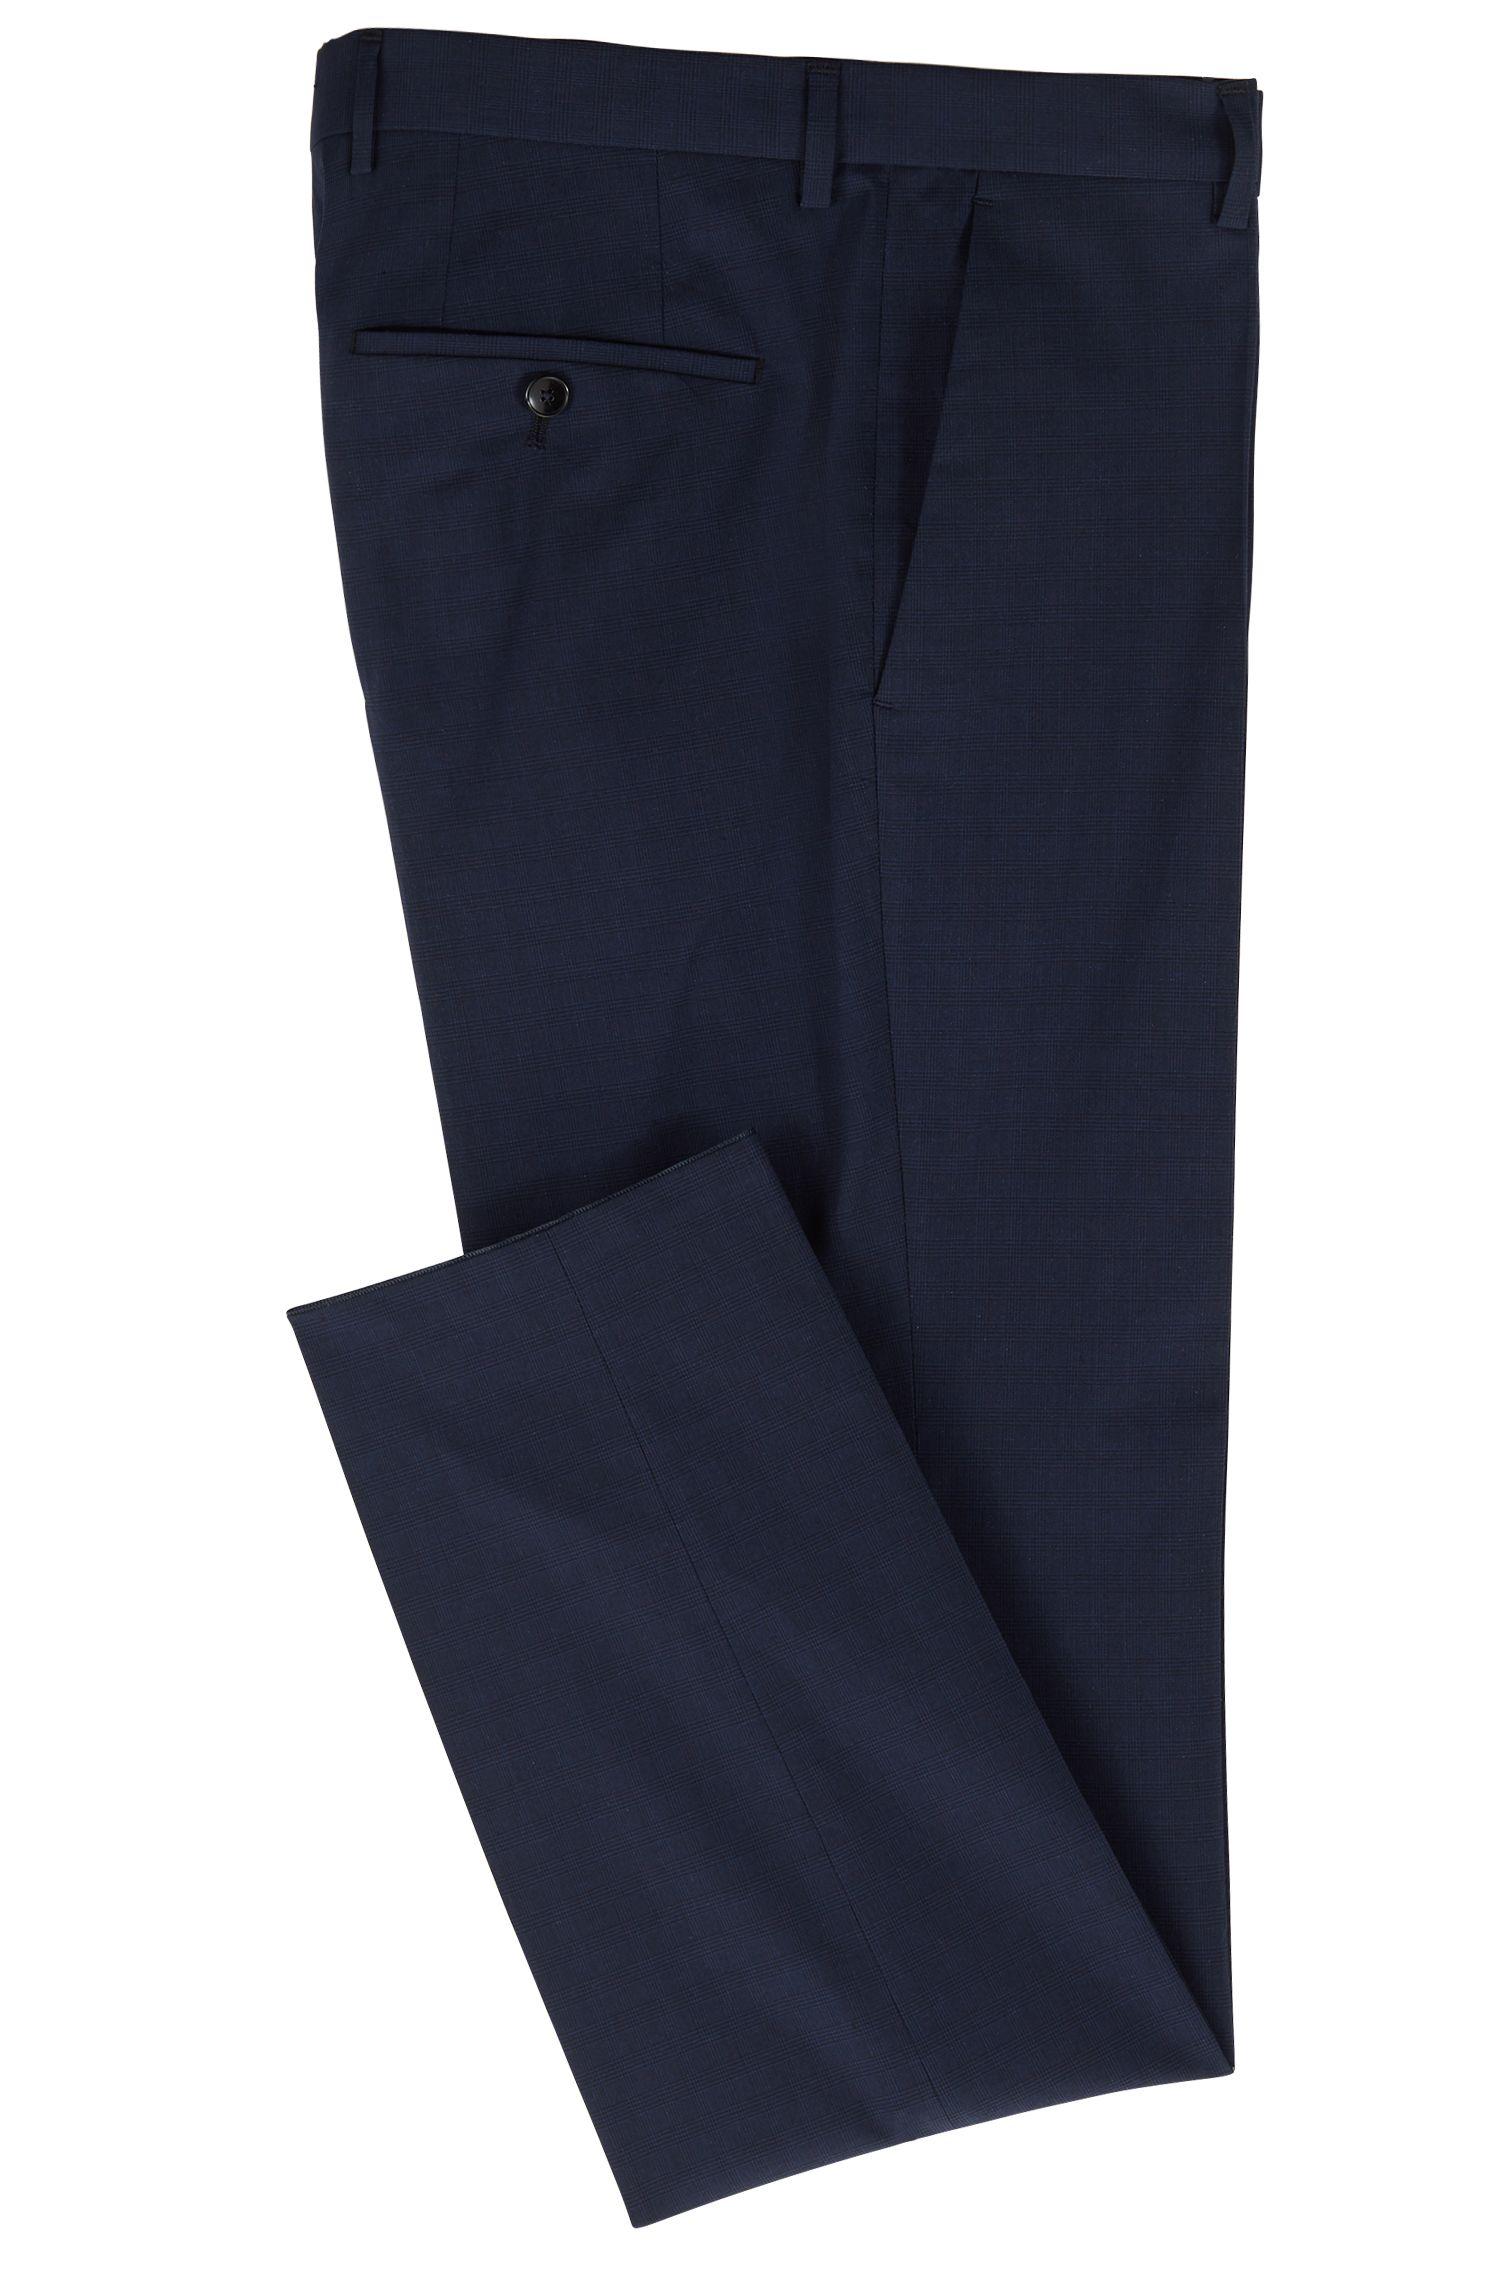 Slim-fit pants in melange stretch cotton, Open Blue